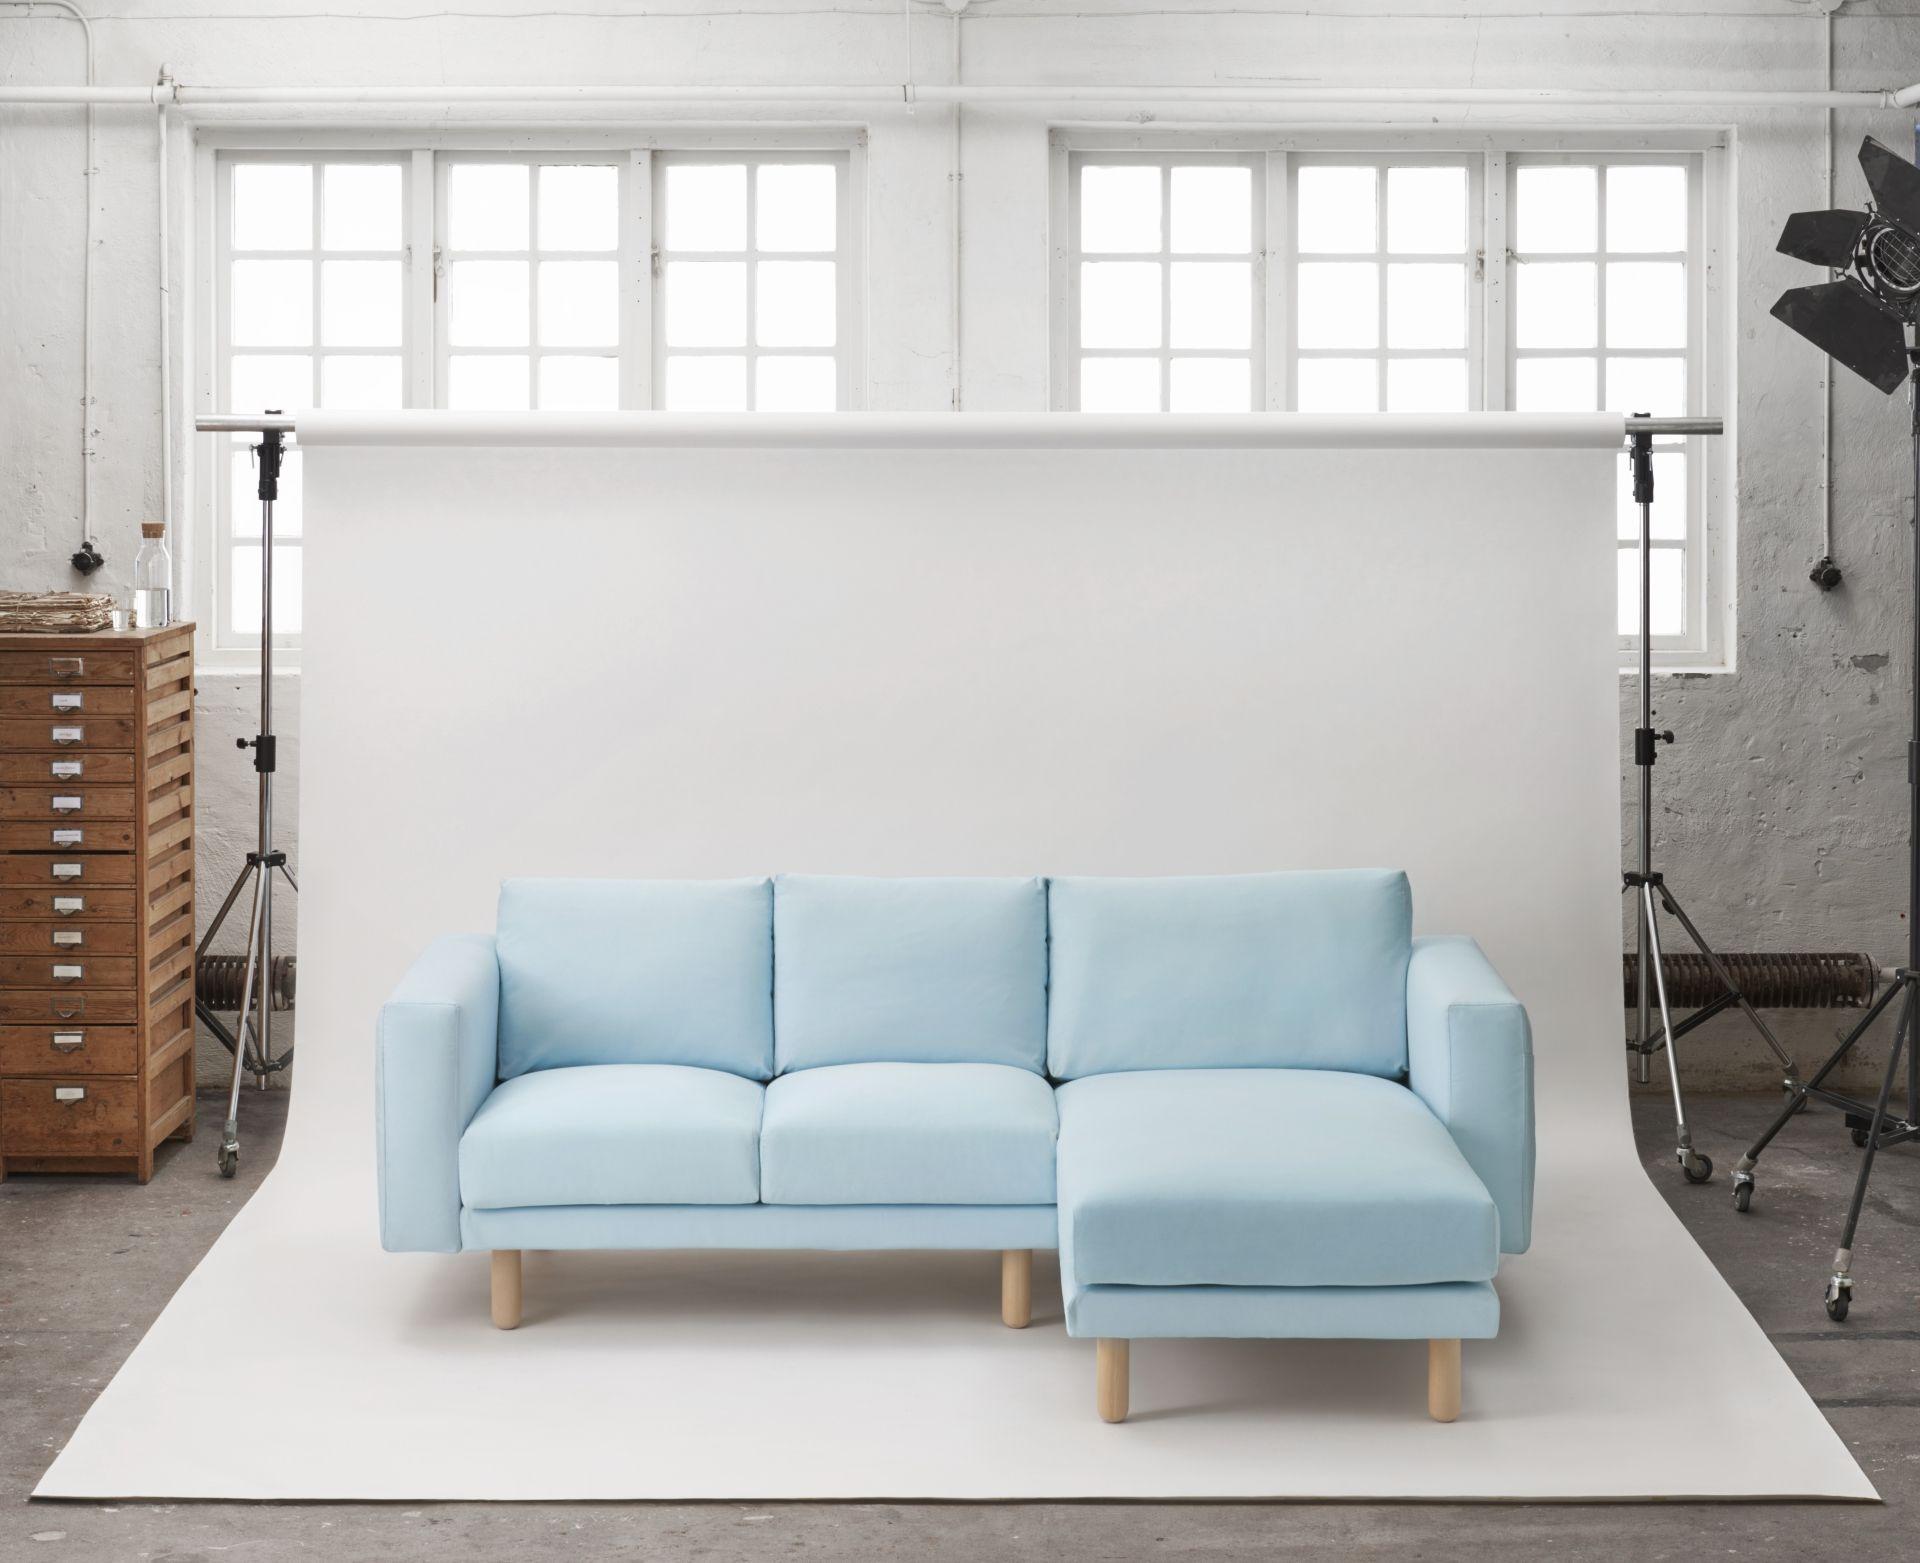 Loungebank Kussens Ikea : Bank ikea norsborg norsborg zitselement edum heldergroen